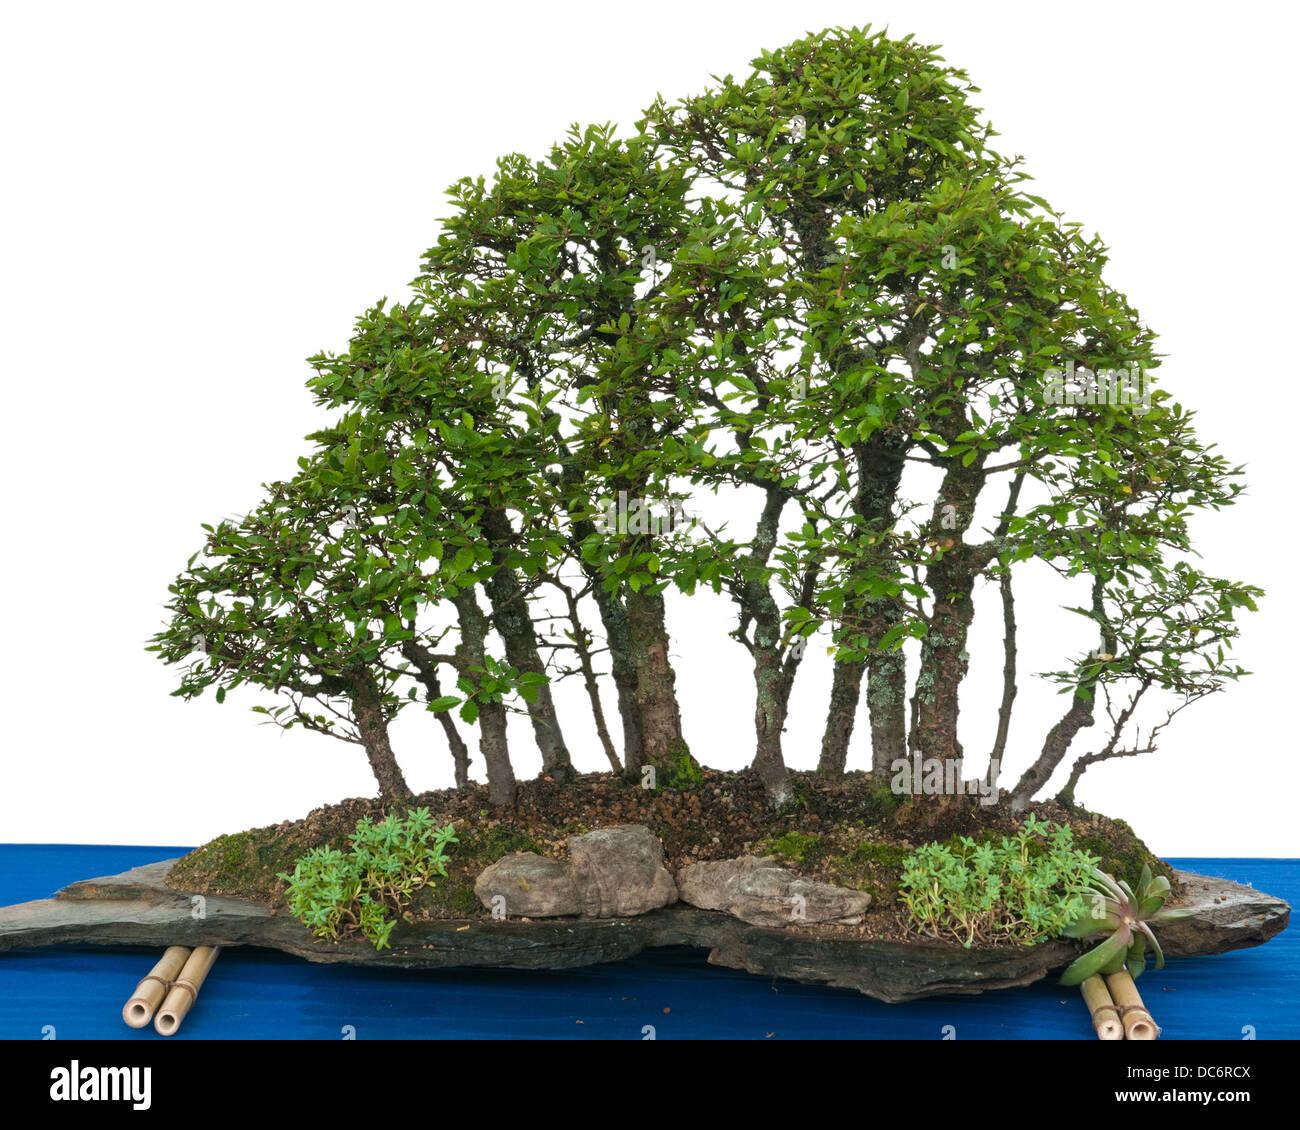 Forest with elm bonsai trees (Zelkova nire) on a stone slate - Stock Image